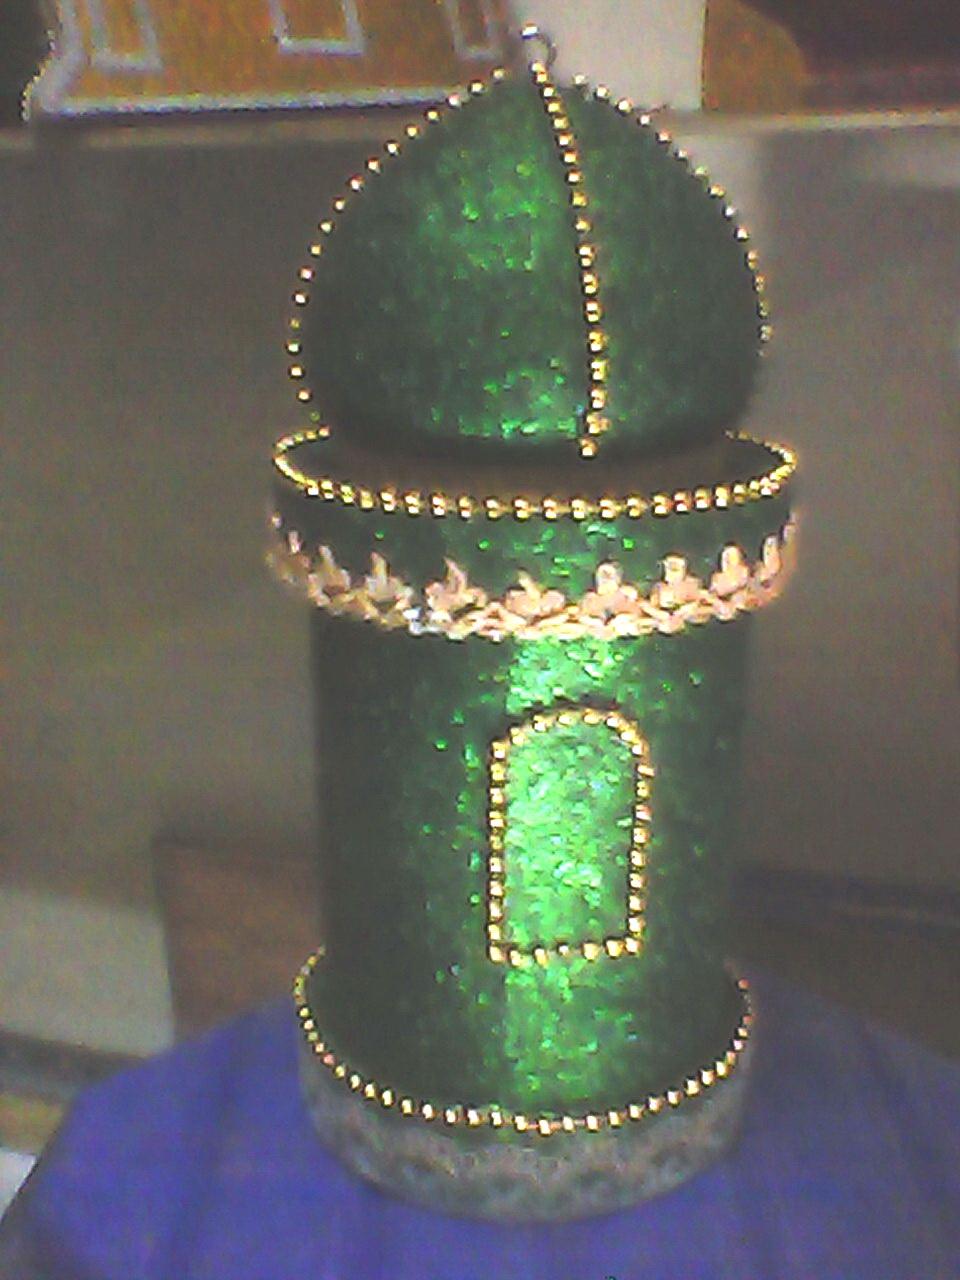 Miniatur Masjid Dari Styrofoam : miniatur, masjid, styrofoam, Aksesoris, Fitri, Natal:, Menara, Kubah, Masjid